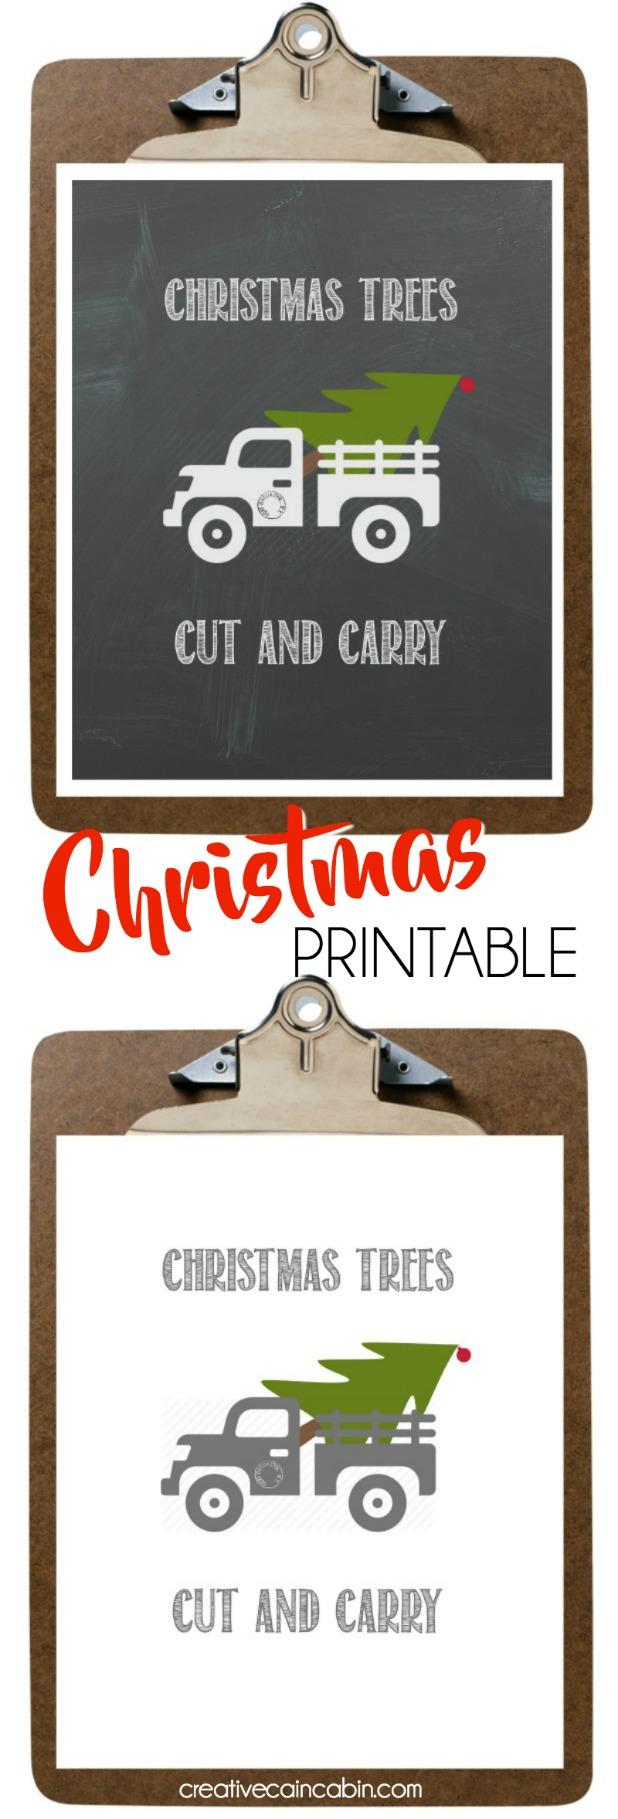 Christmas Tree Farm Truck Printable Cut and Carry